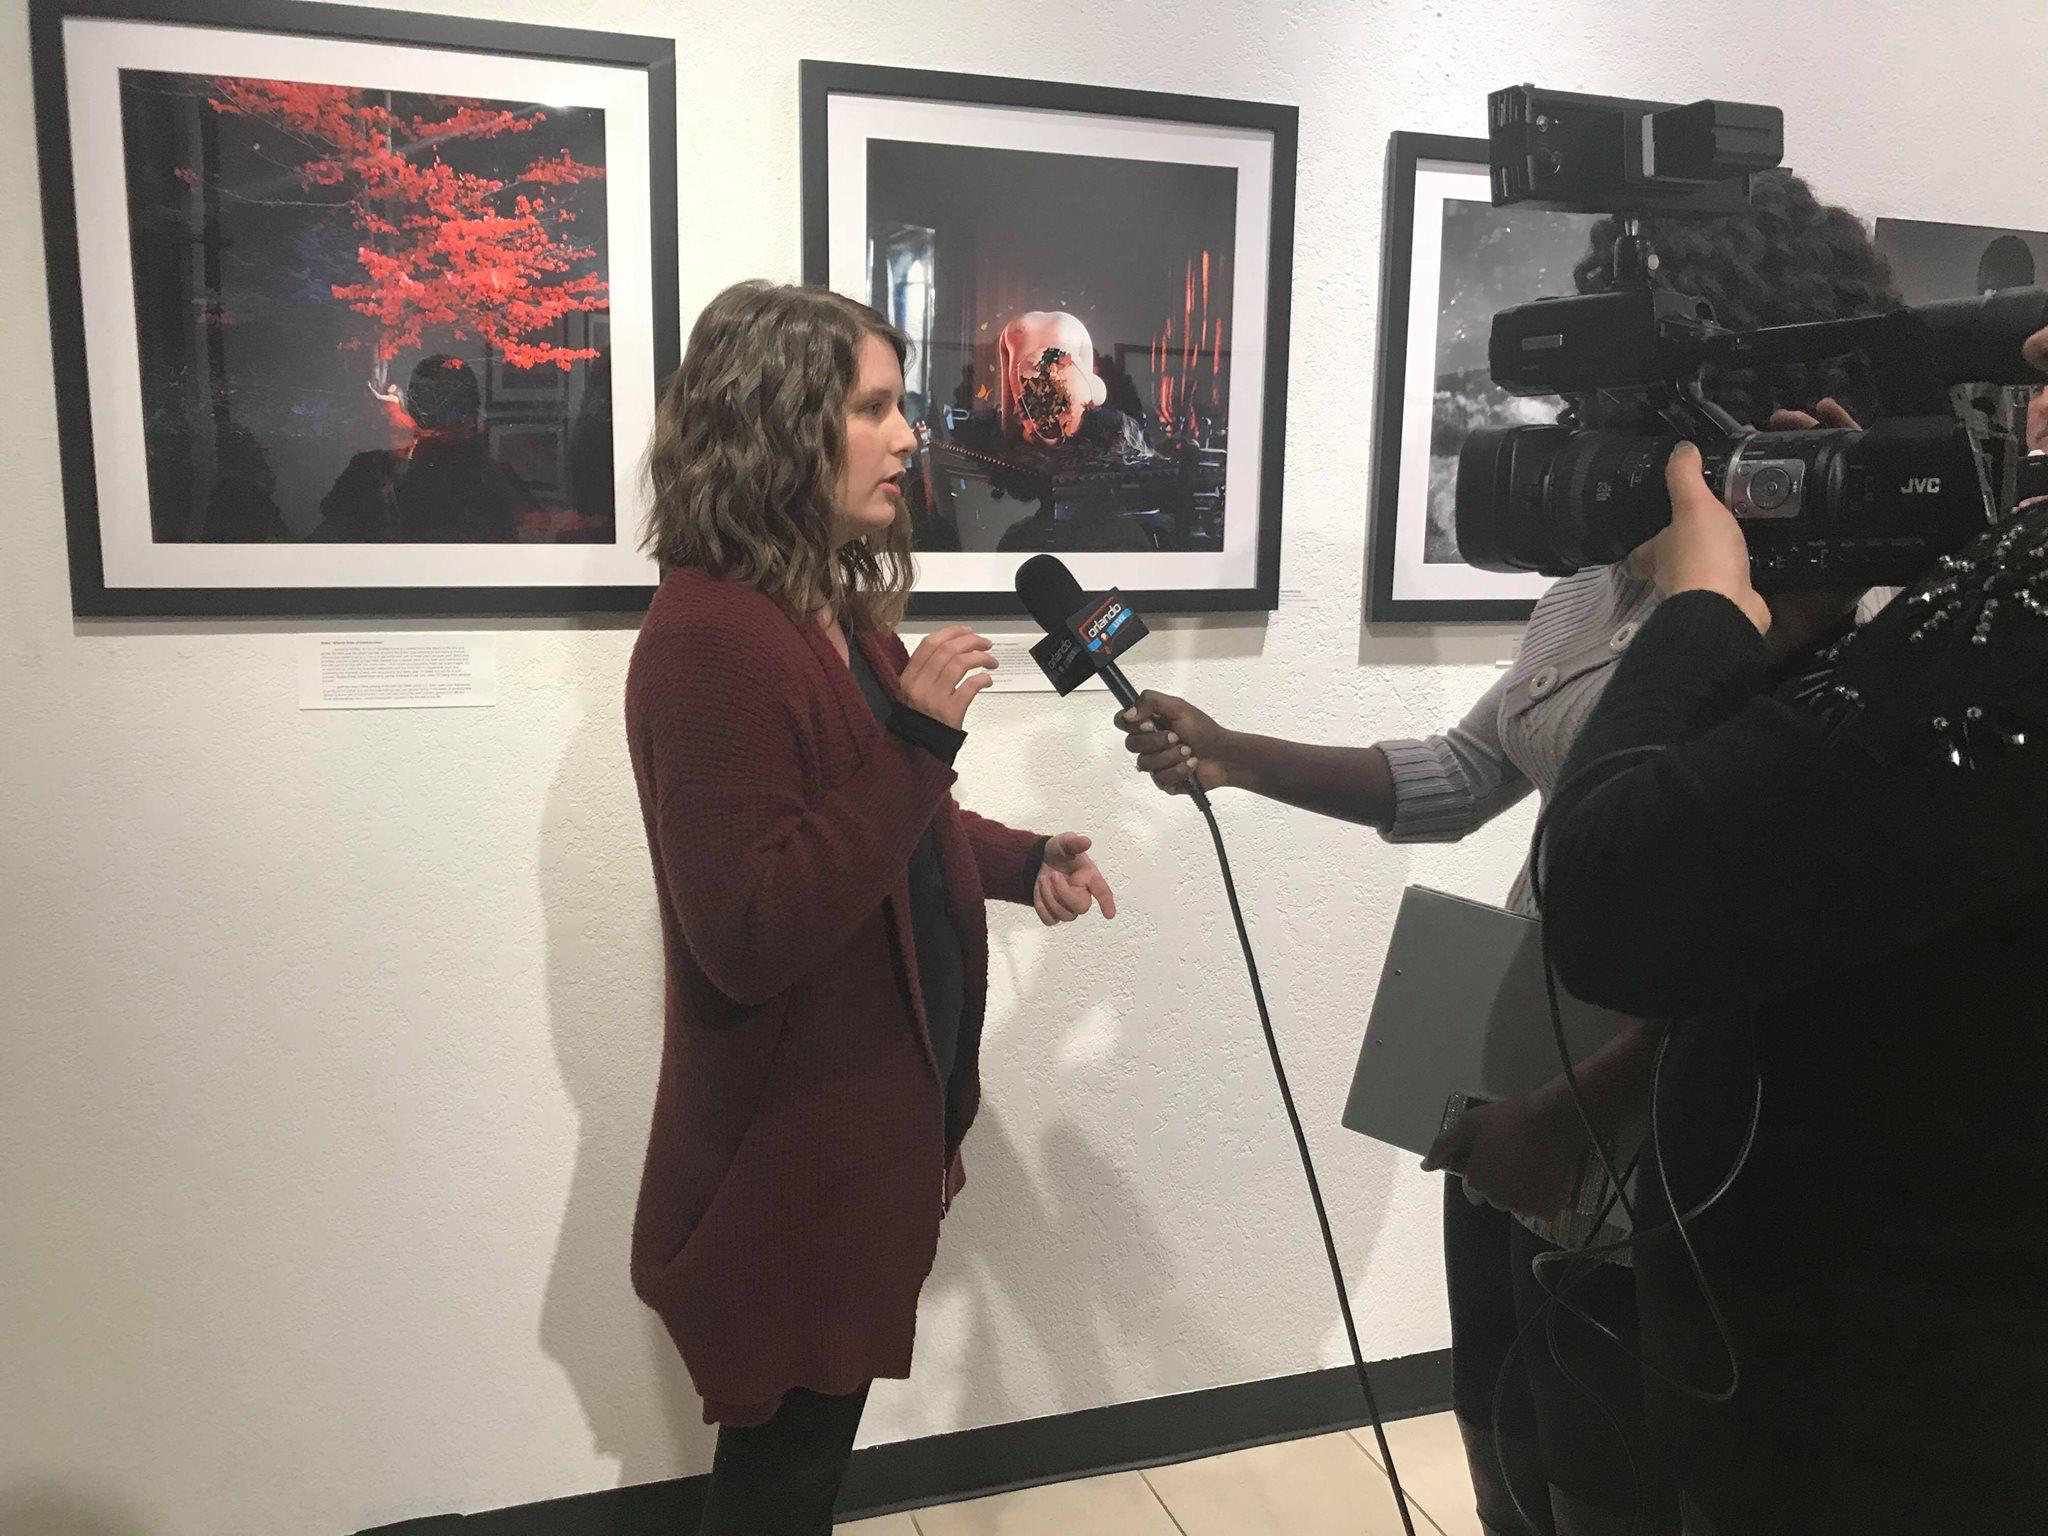 Samantha Goss of Sleeping Awake Photography being interviewed about her work.